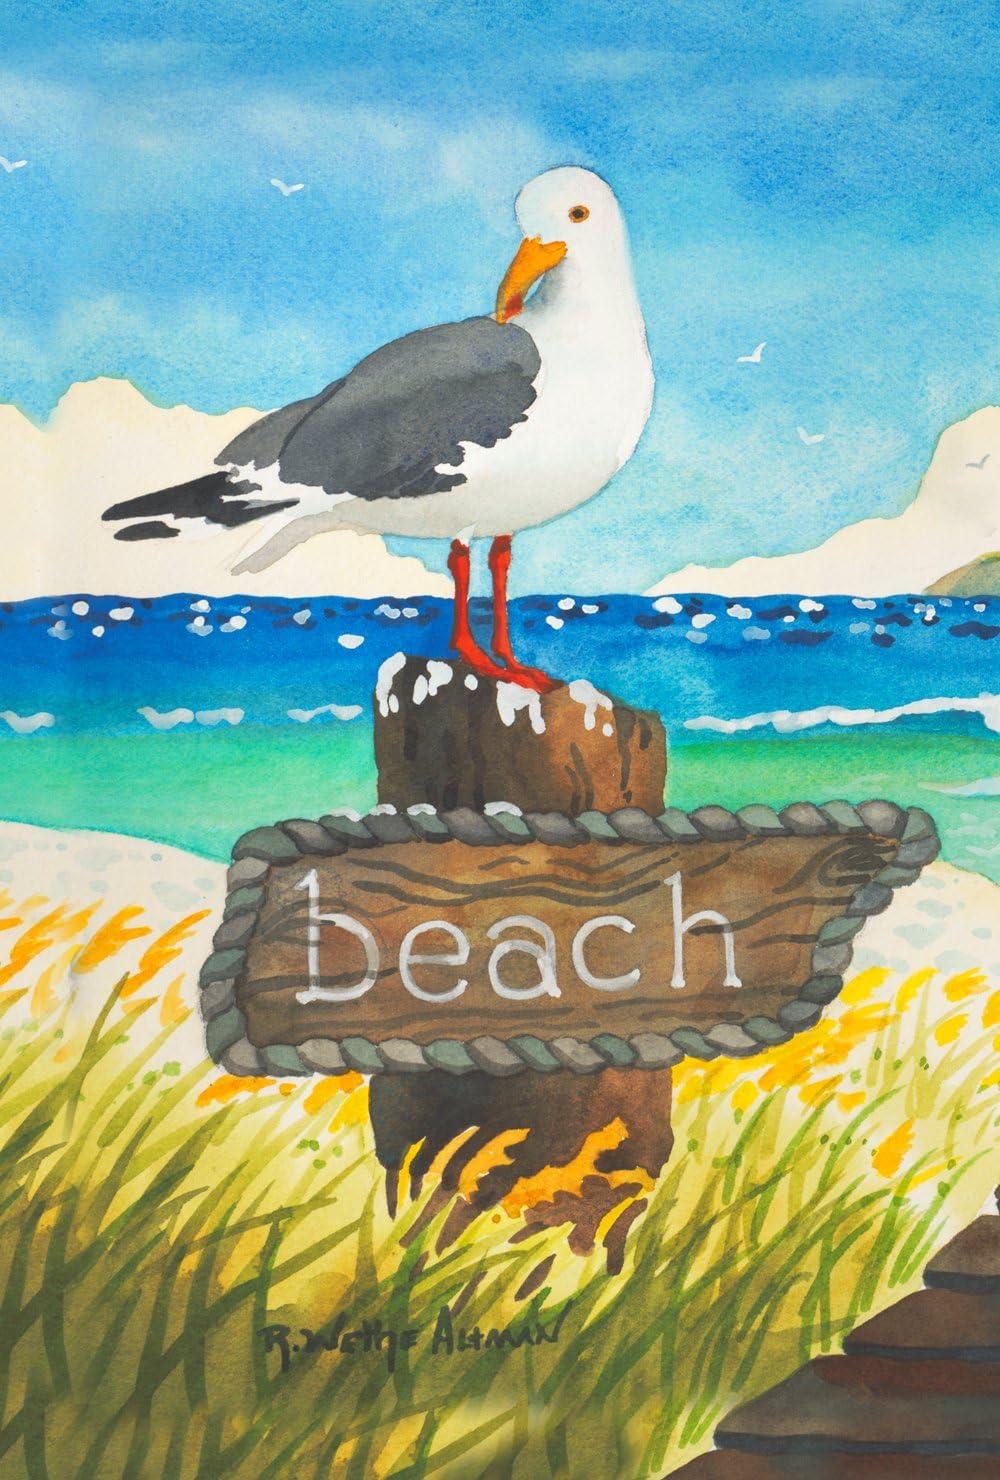 Toland Home Garden Beach Bird 28 x 40 Inch Decorative Summer Ocean Seagull House Flag